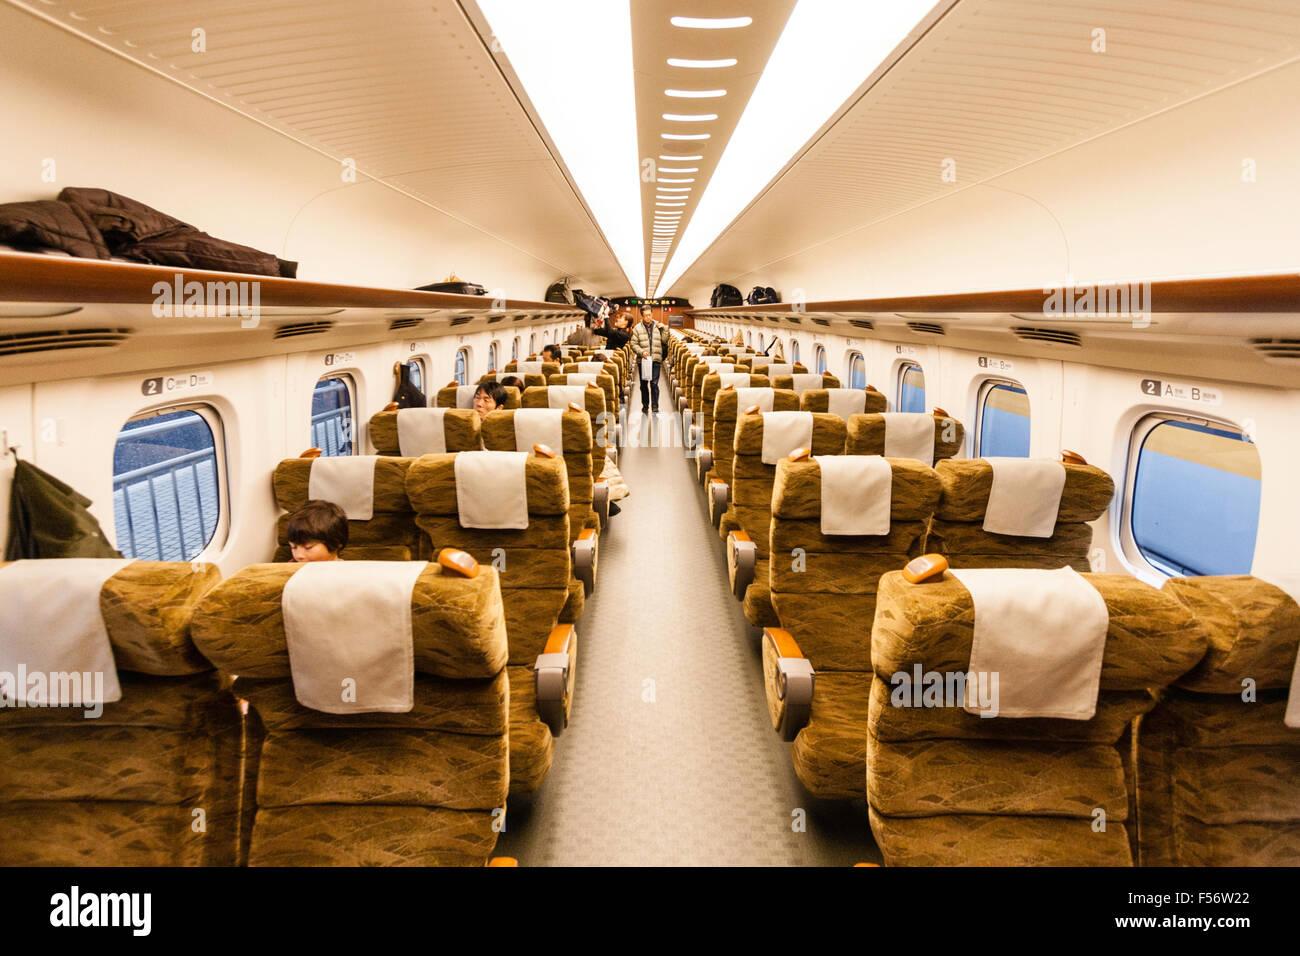 Japanese Shinkansen Bullet Train Interior Showing 2x2